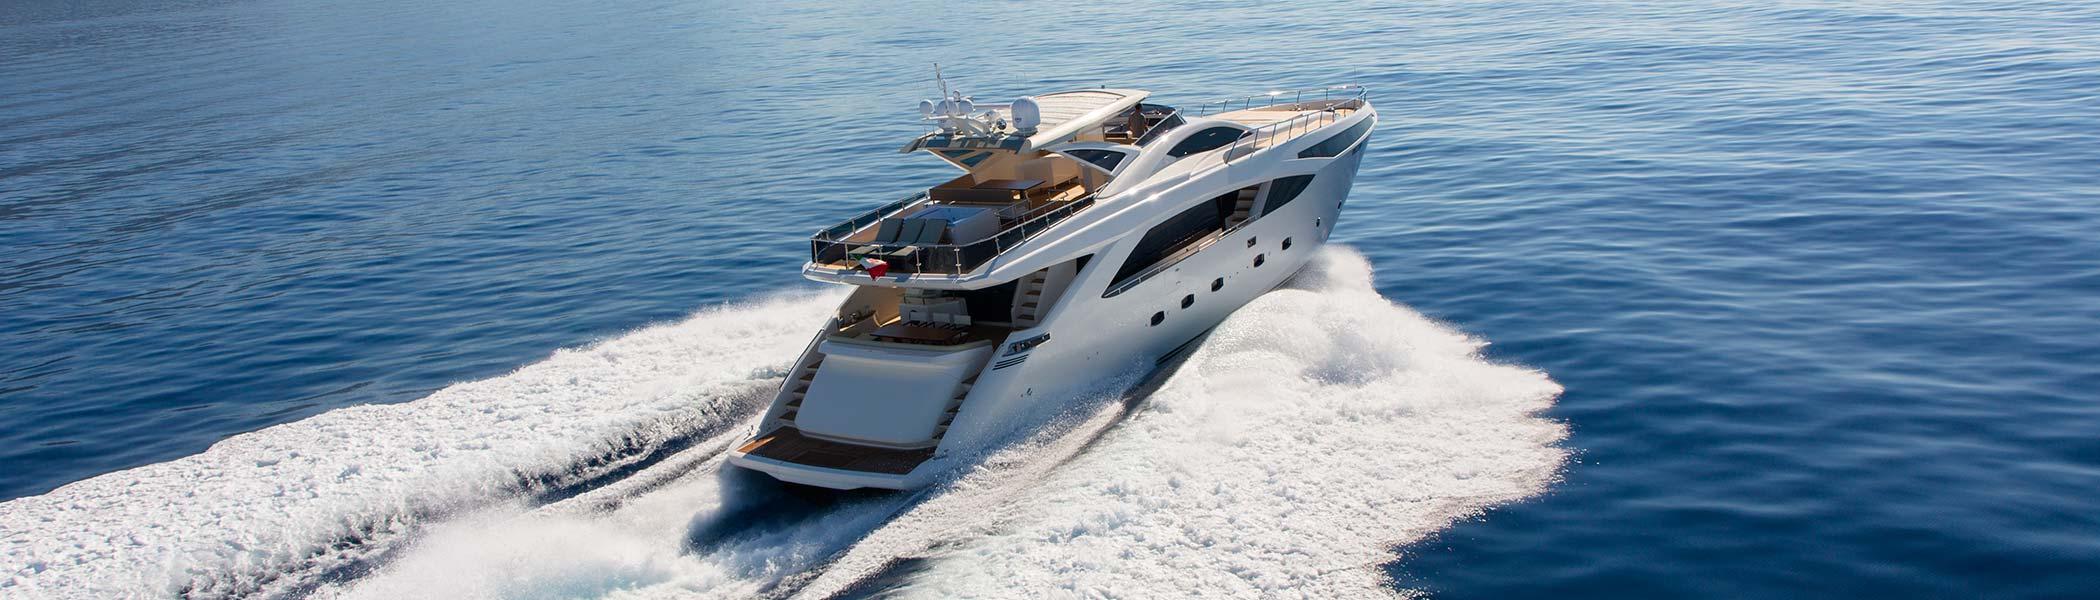 Amer Yacht - Amer Cento - NAVIGAZIONE-53